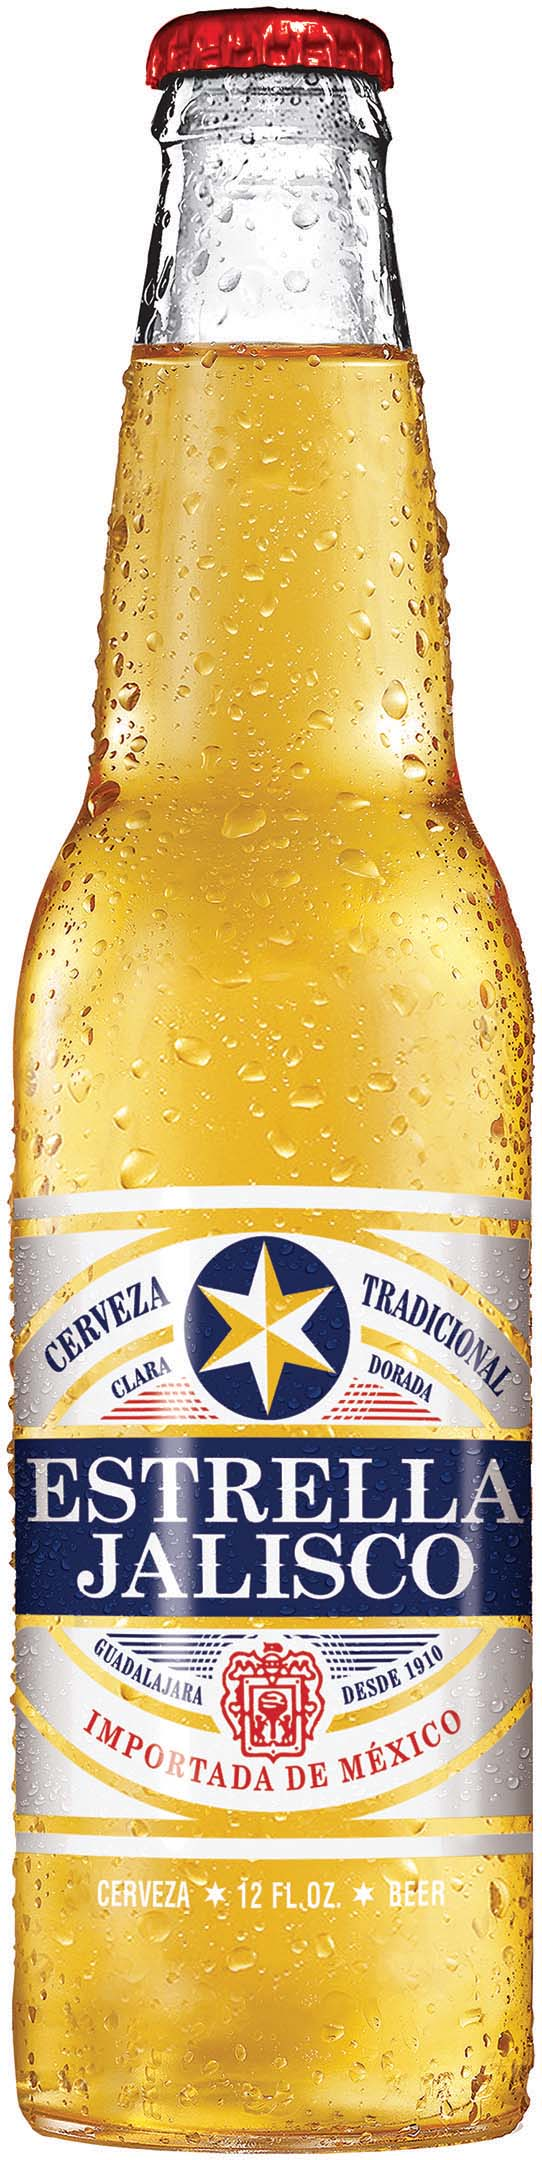 Estrella Jalisco Wants to Quench the Thirst of U.S. Hispanics.